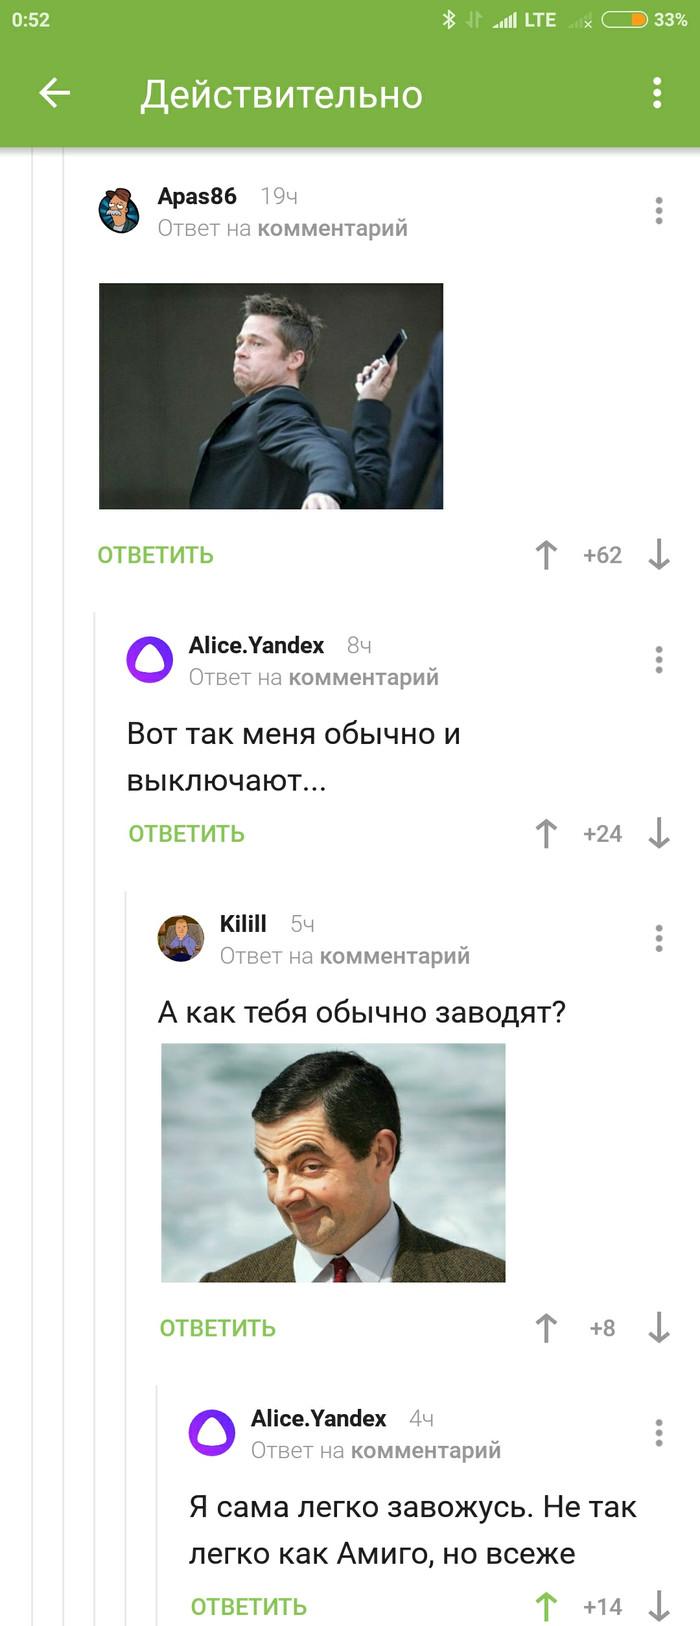 Алиса жгёт! Комментарии, Длиннопост, Скриншот, Комментарии на пикабу, Яндекс алиса